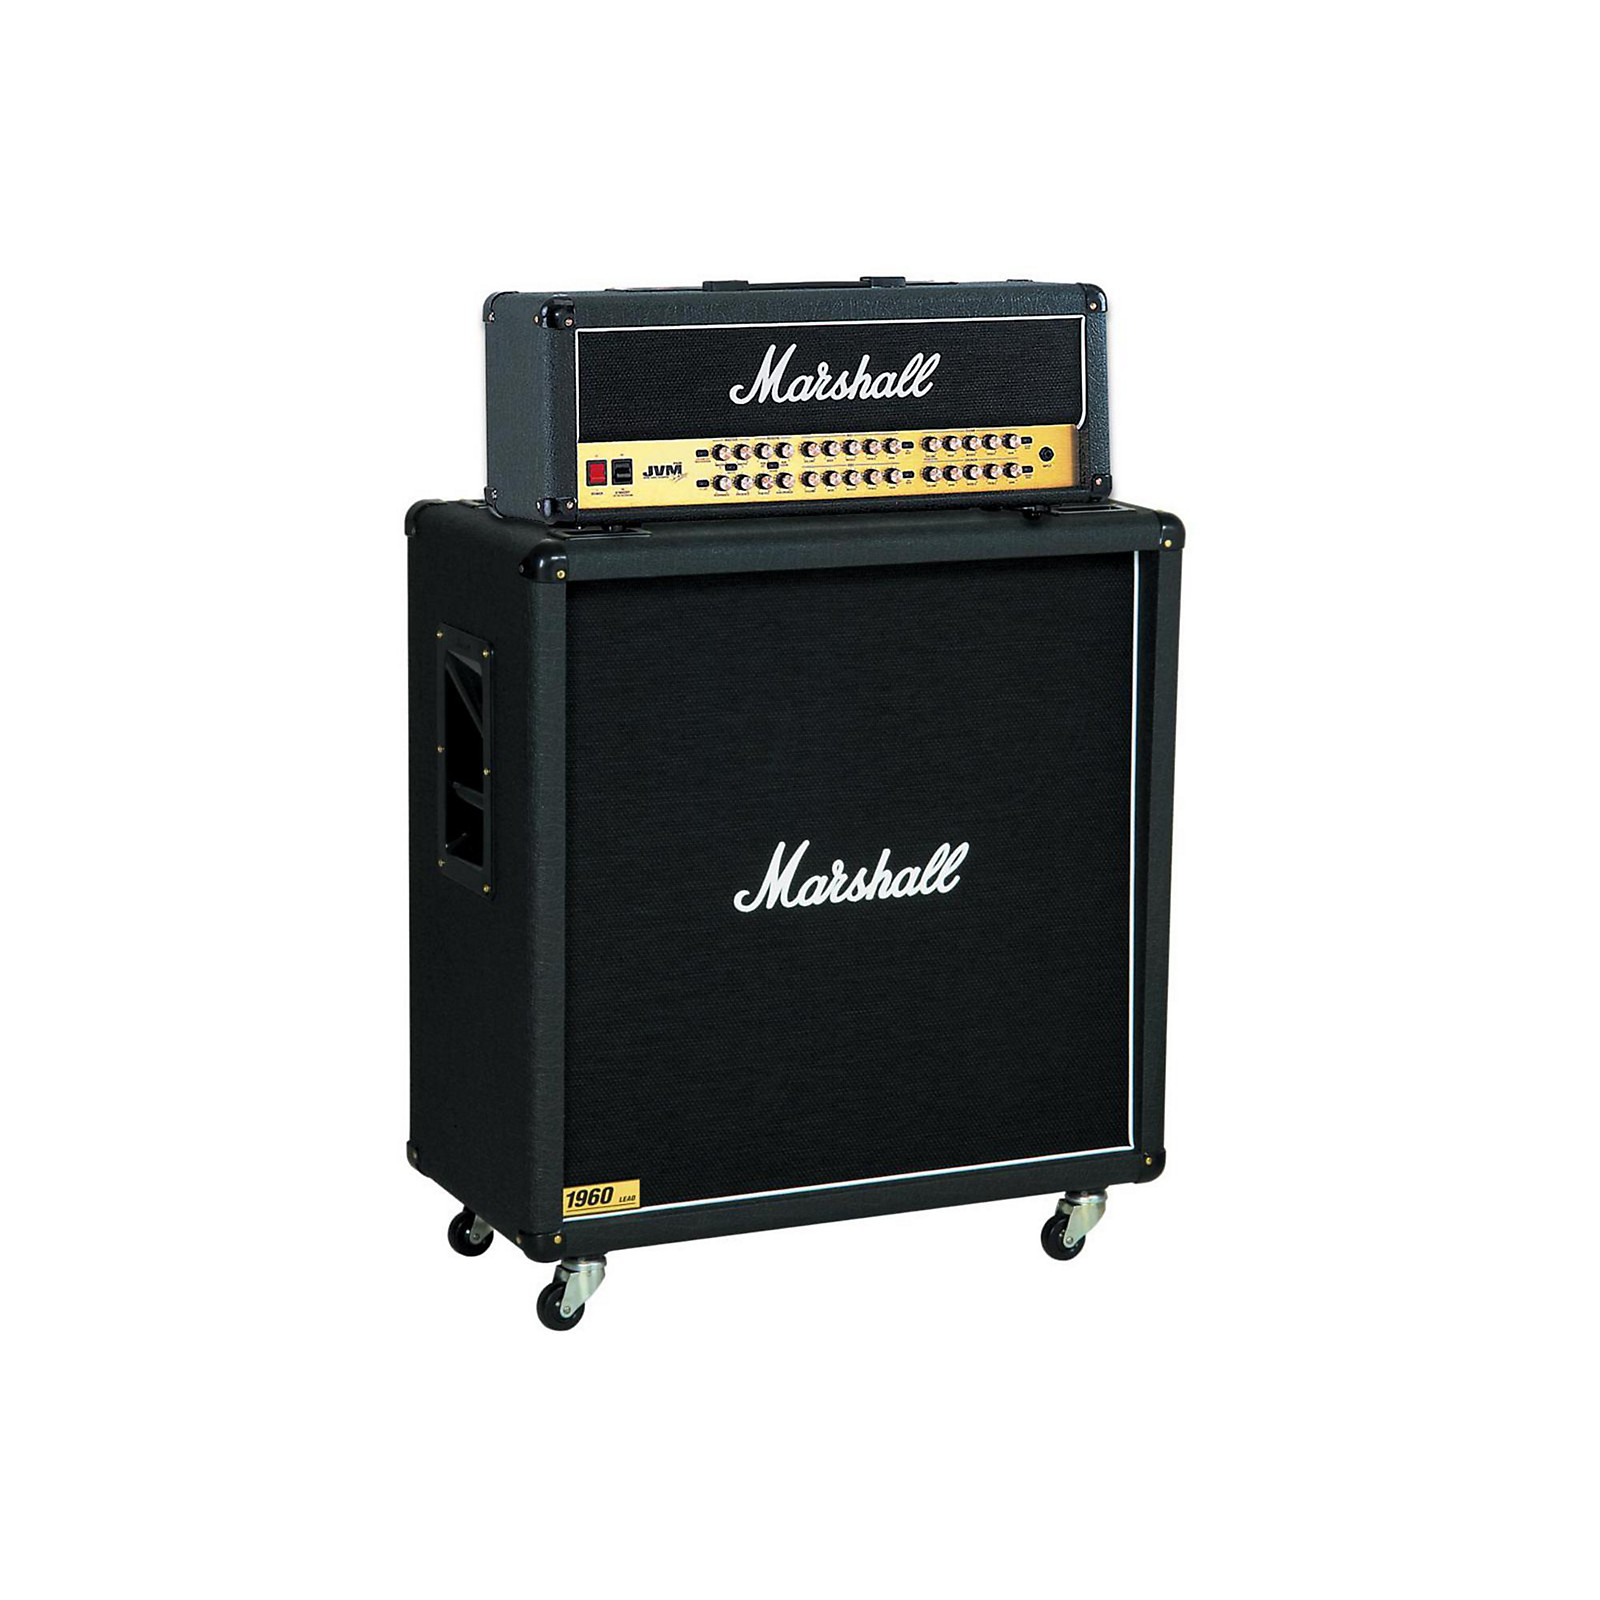 Marshall JVM Series JVM410H 100W Guitar Tube Head with 1960B 300W 4x12 Cab